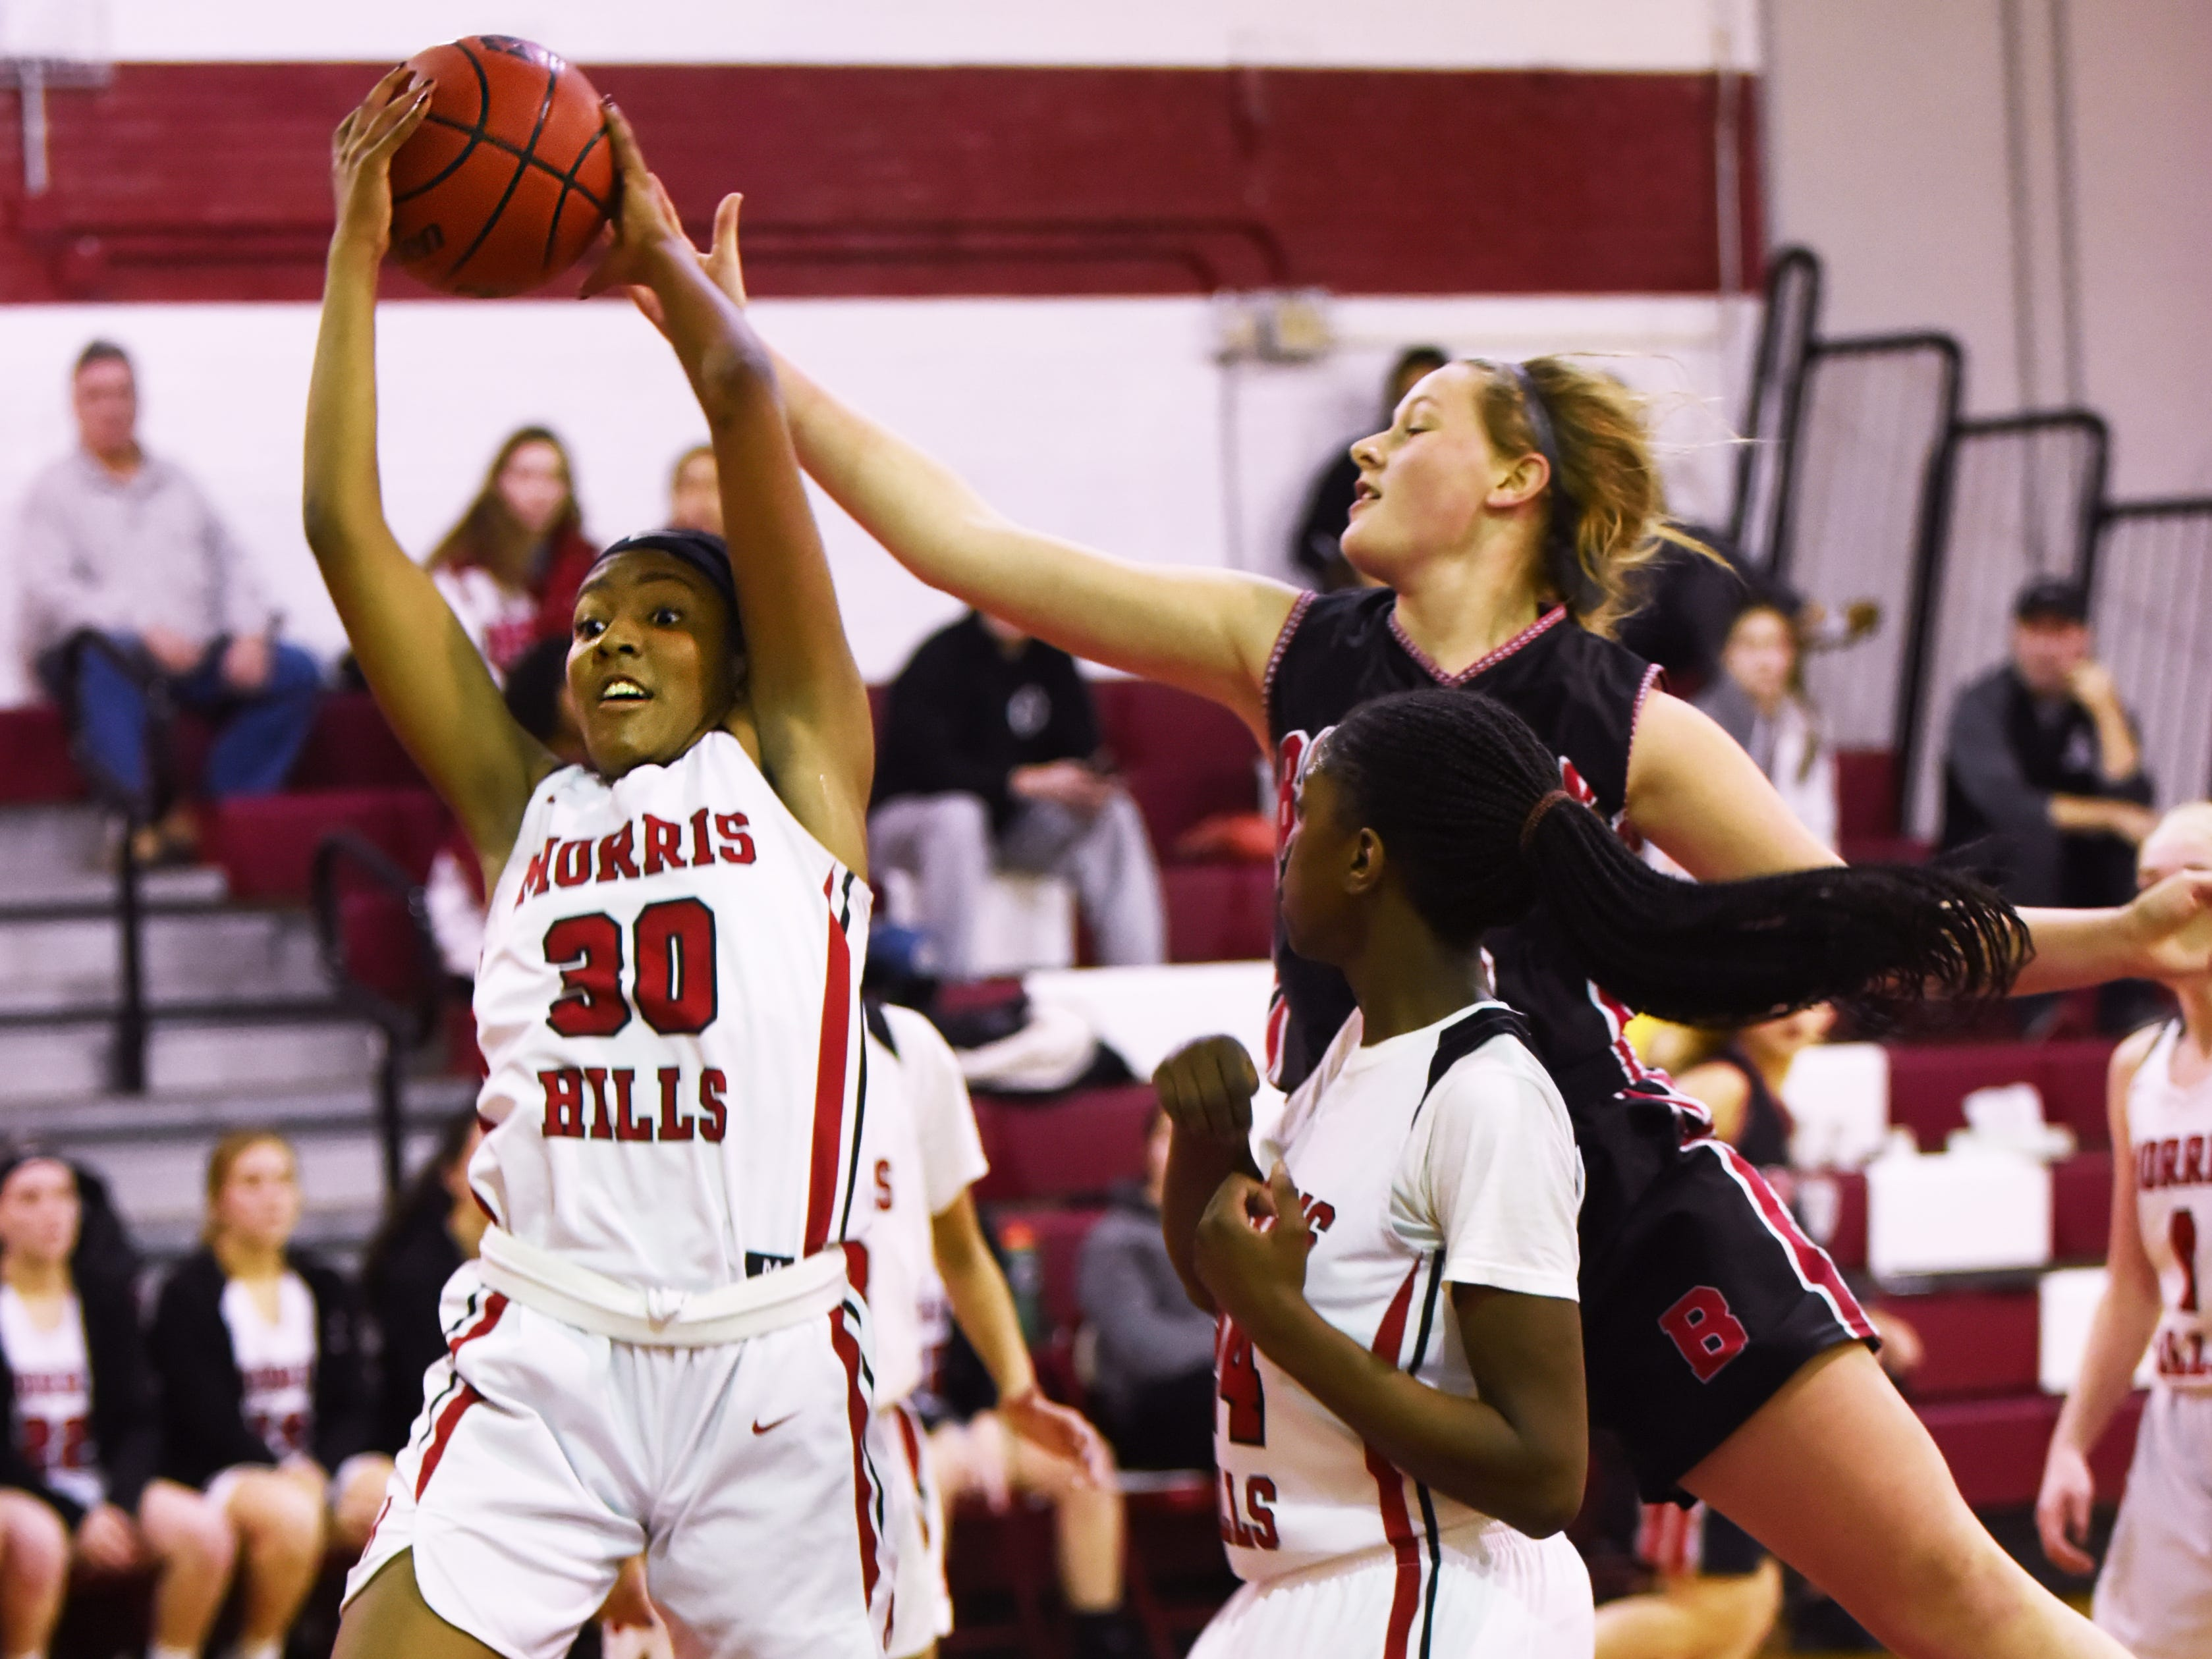 Boonton Vs. Morris Hills girls basketball game at the Morris Hills Holiday Tournament in Rockaway on Friday December 28, 2018. MH#30 Tamrya Turner has the ball.